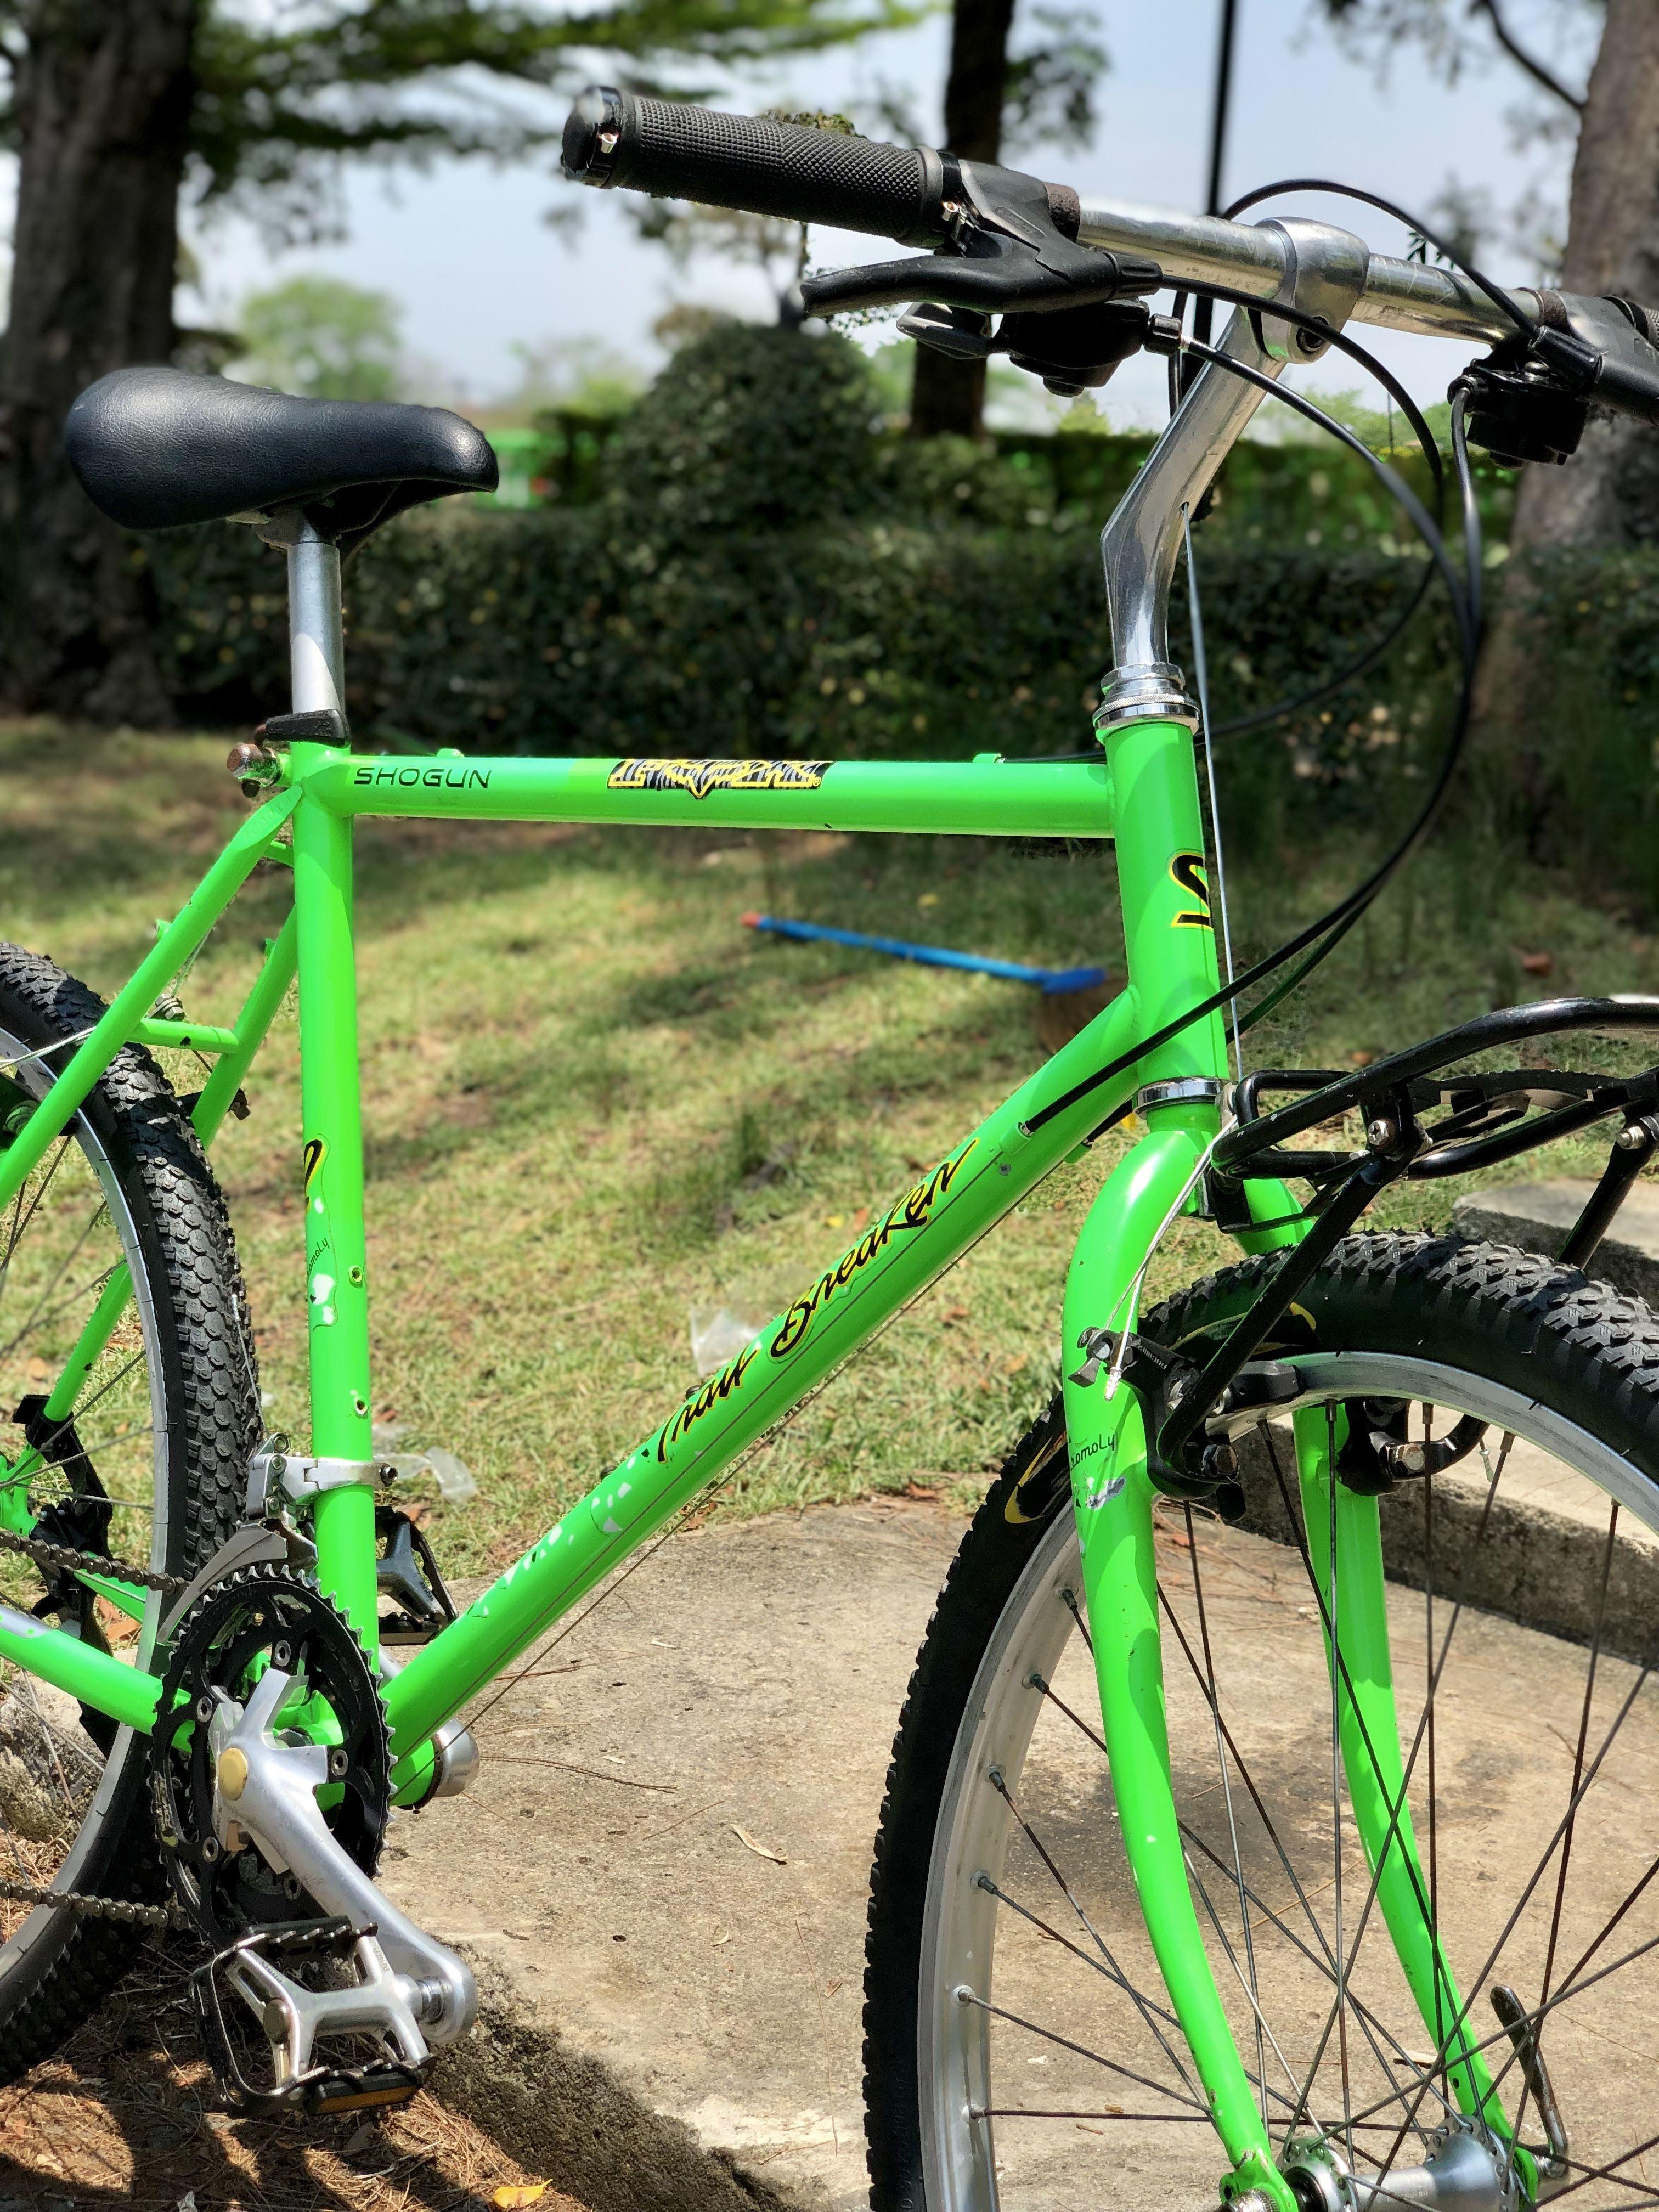 1cd717e5bdd Shogun Trail Breaker 2 rebuilt | Retro Mountain bike